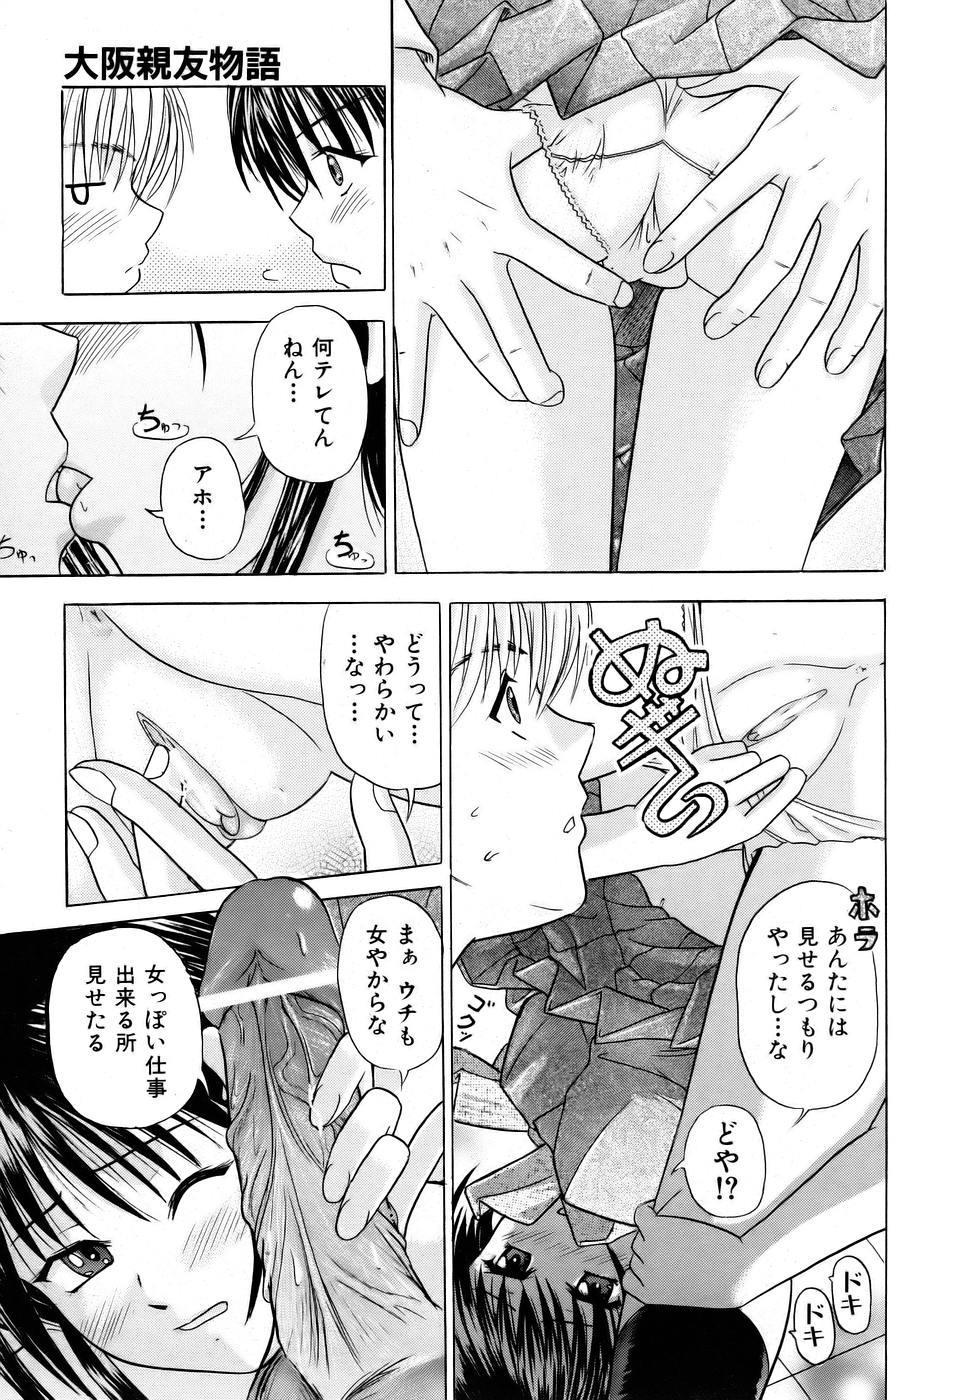 COMIC AUN 2005-12 Vol. 115 286